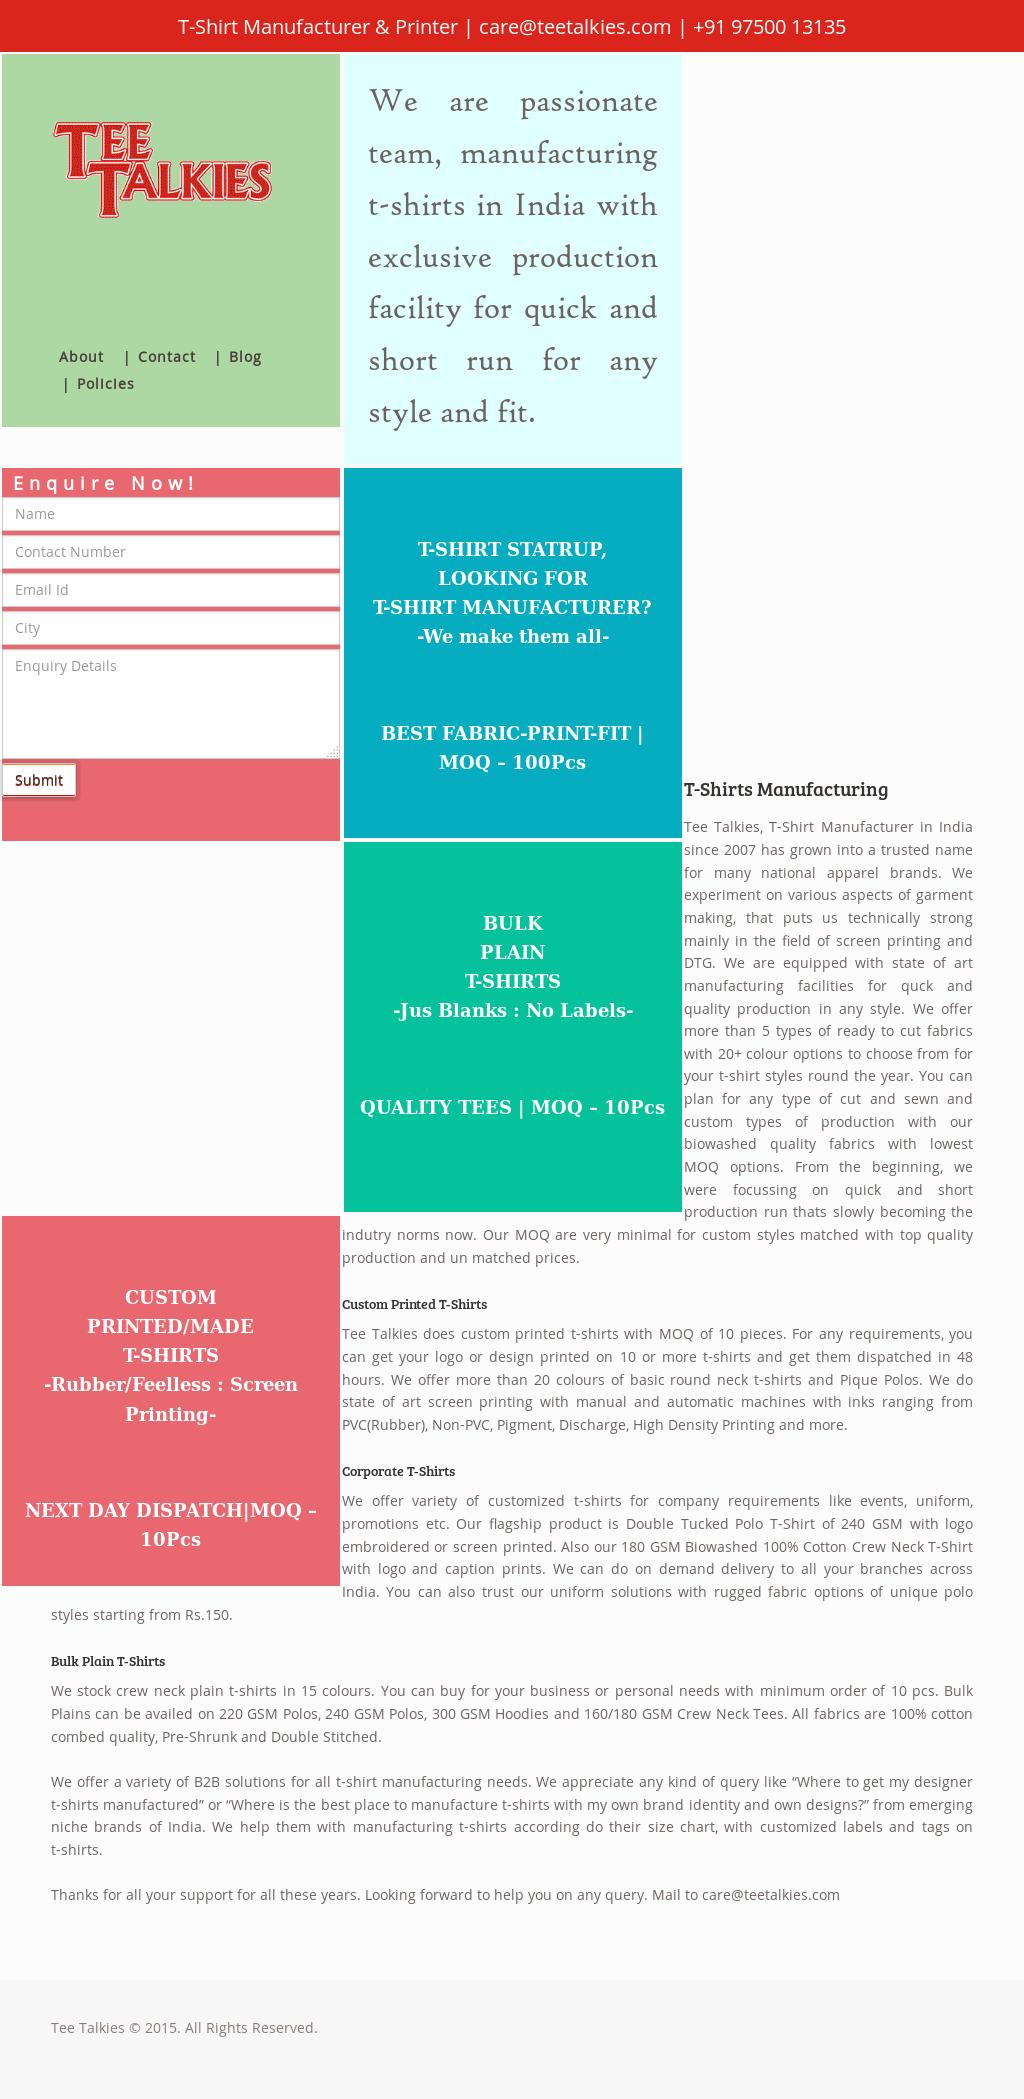 TeeTalkies Competitors, Revenue and Employees - Owler